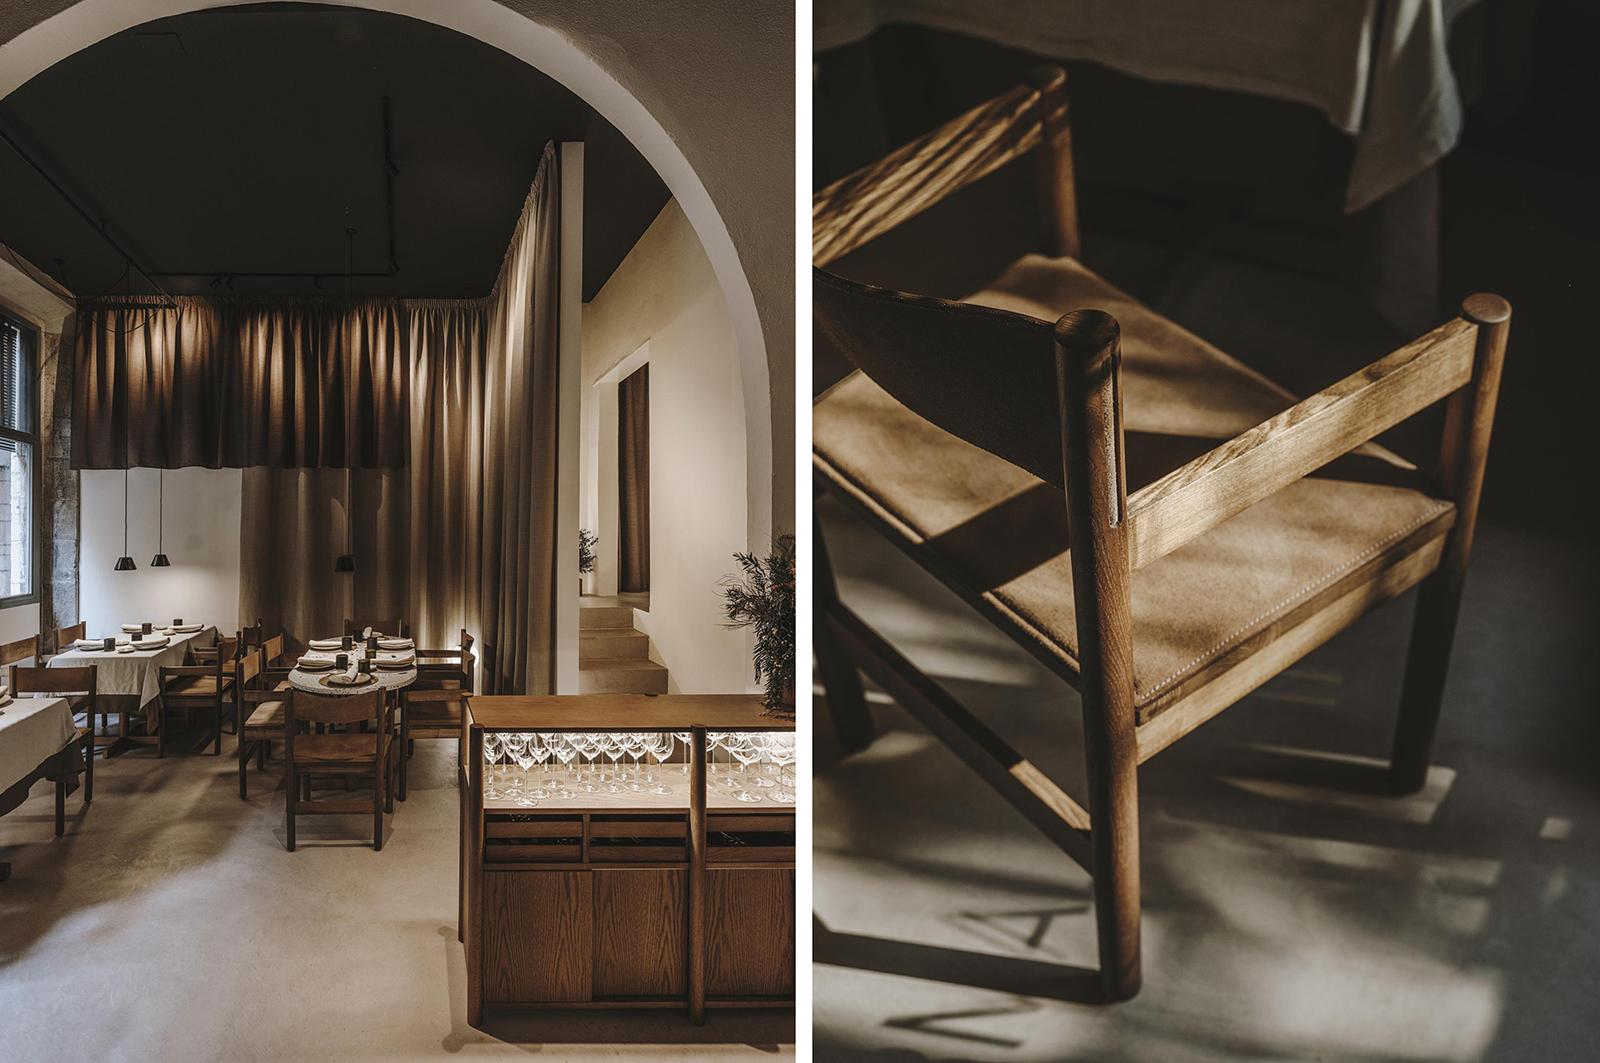 Interiors and furniture are the handiwork of Catalan designed Andreu Carulla